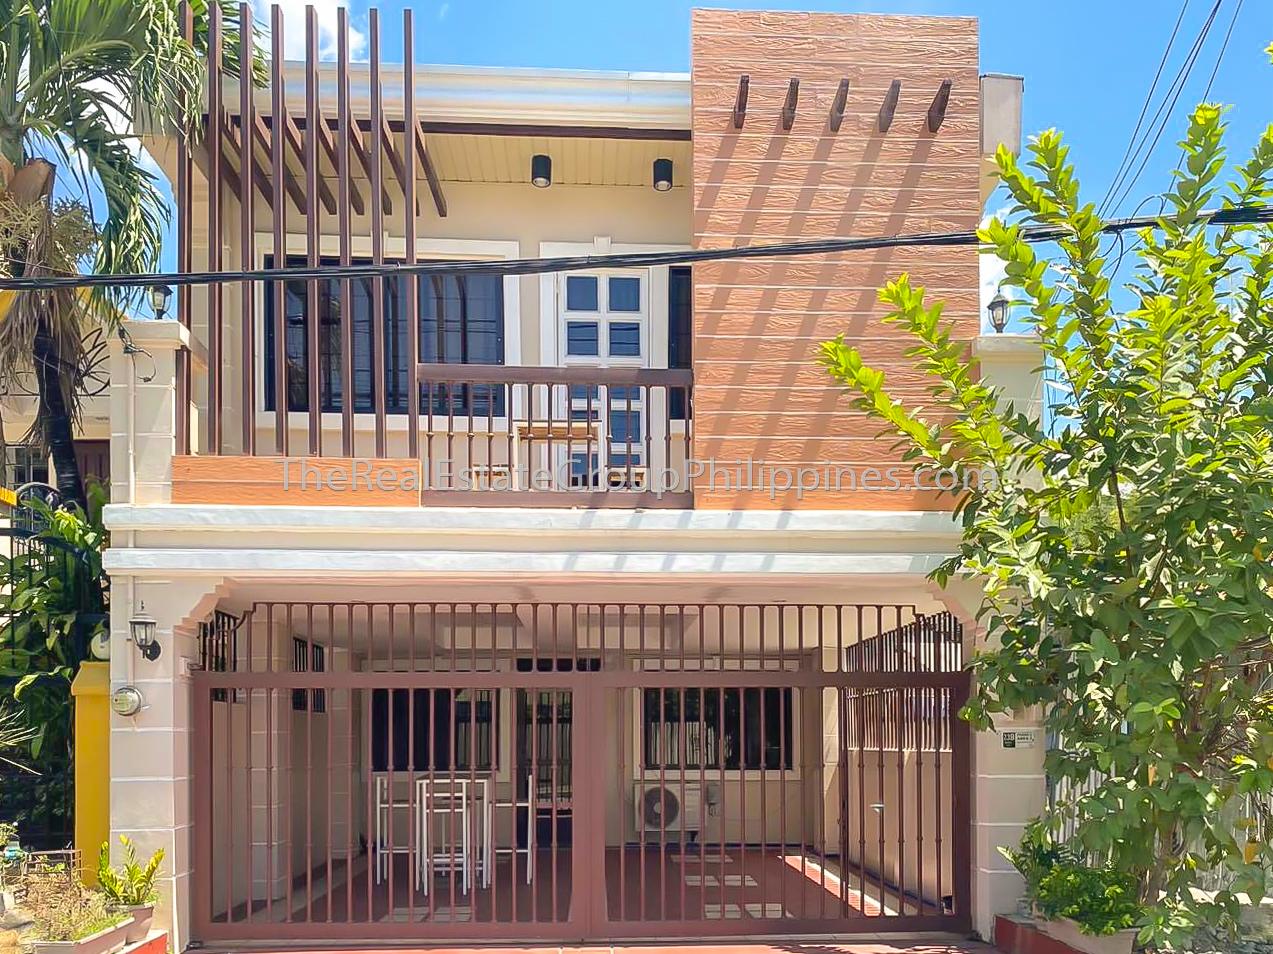 4BR House For Rent, Greenwoods Executive Village, Pasig-110K-1